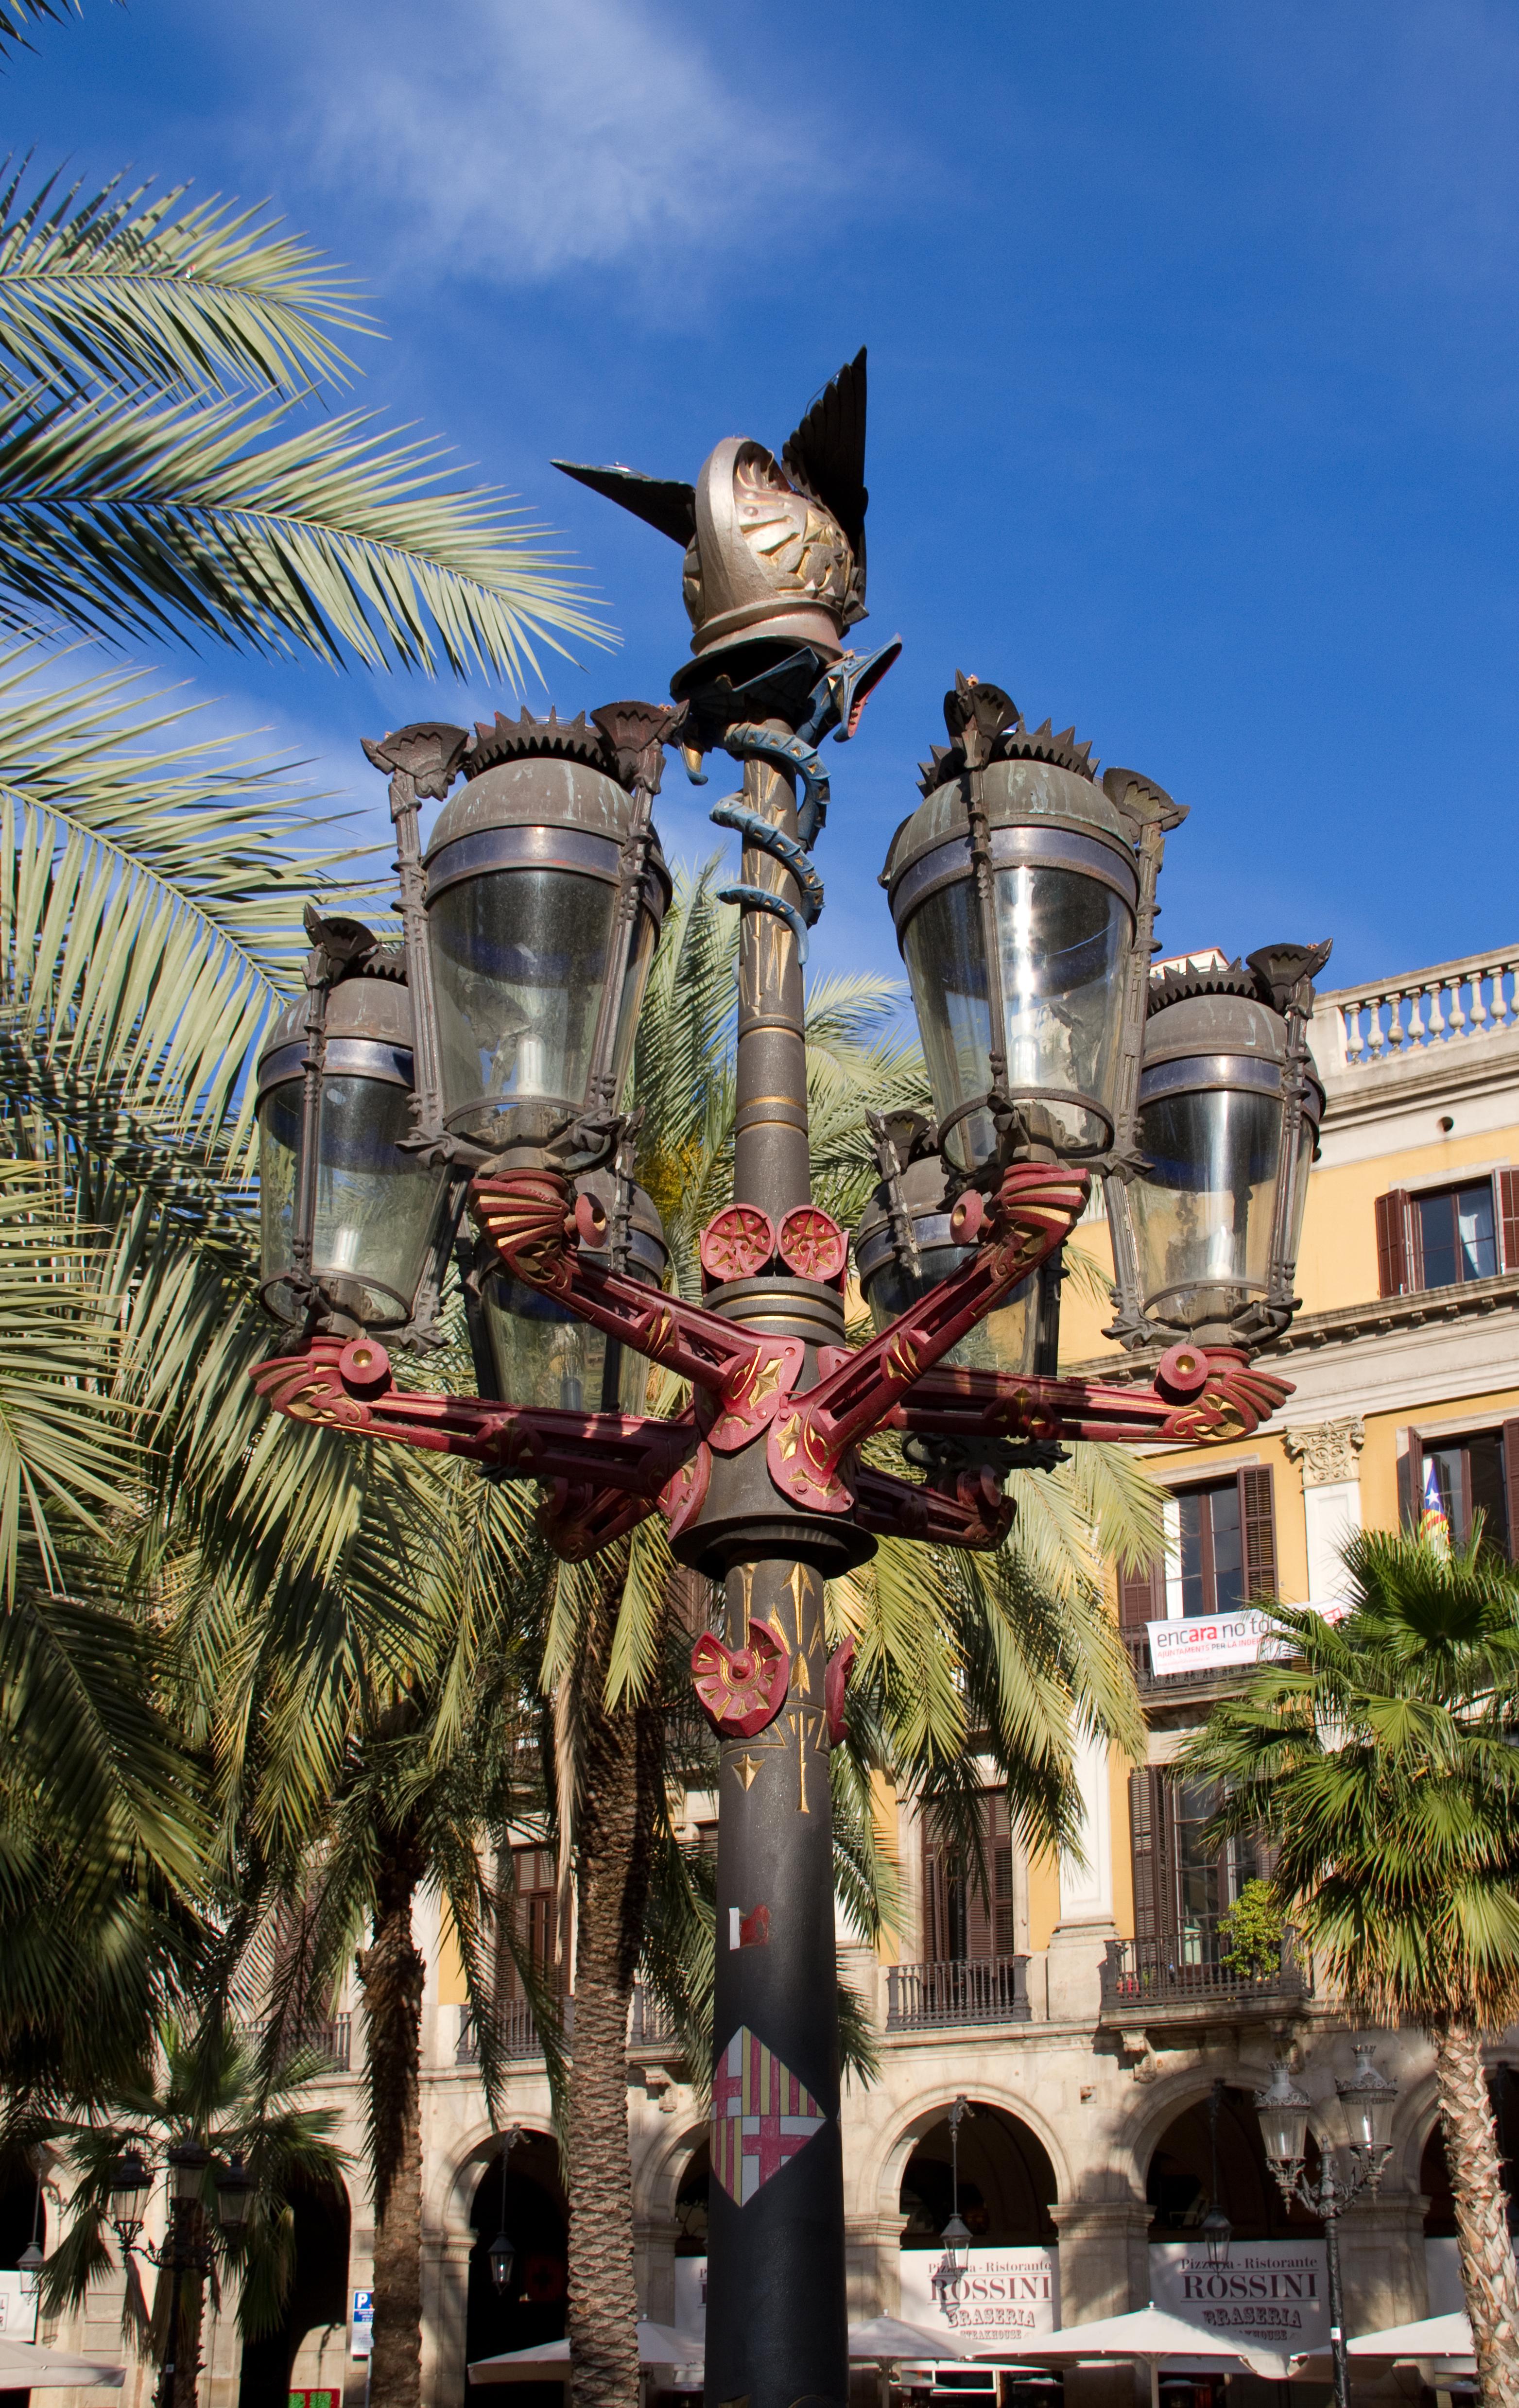 File pla a reial barcelona lamp 5835815593 jpg - Placa kennedy barcelona ...